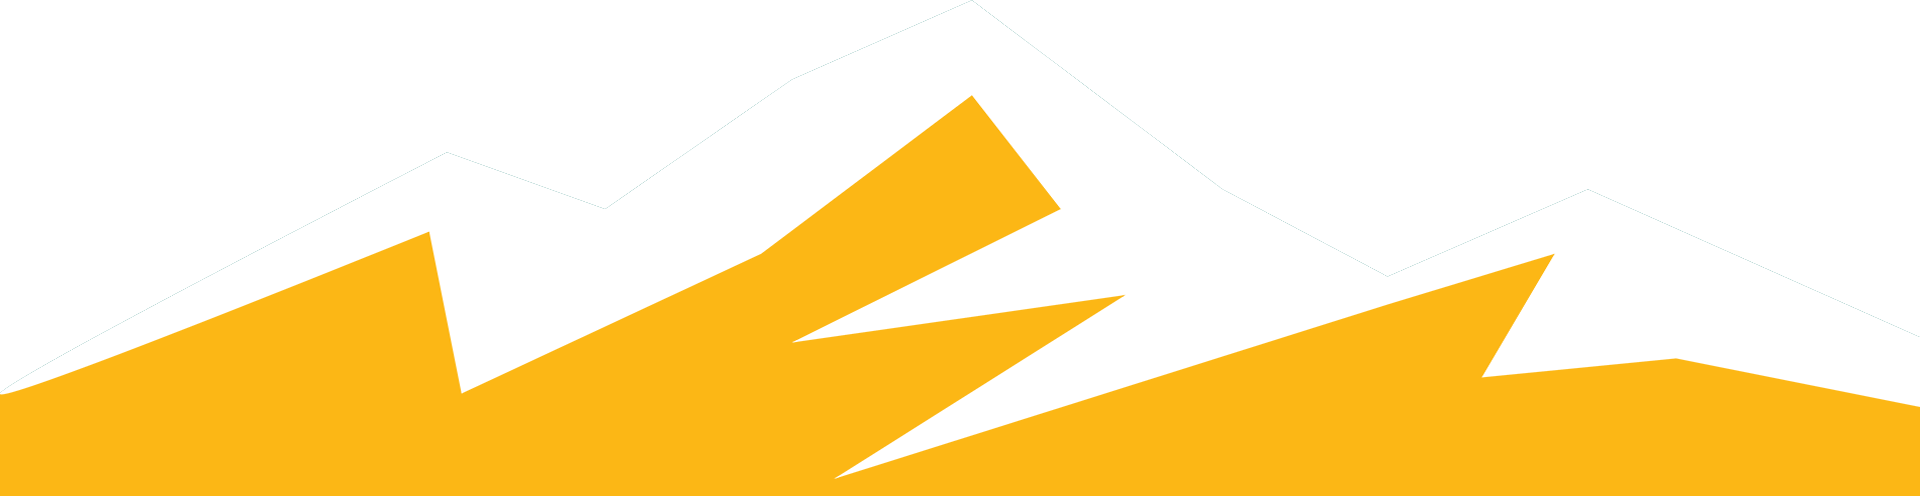 montagne jaune bleu